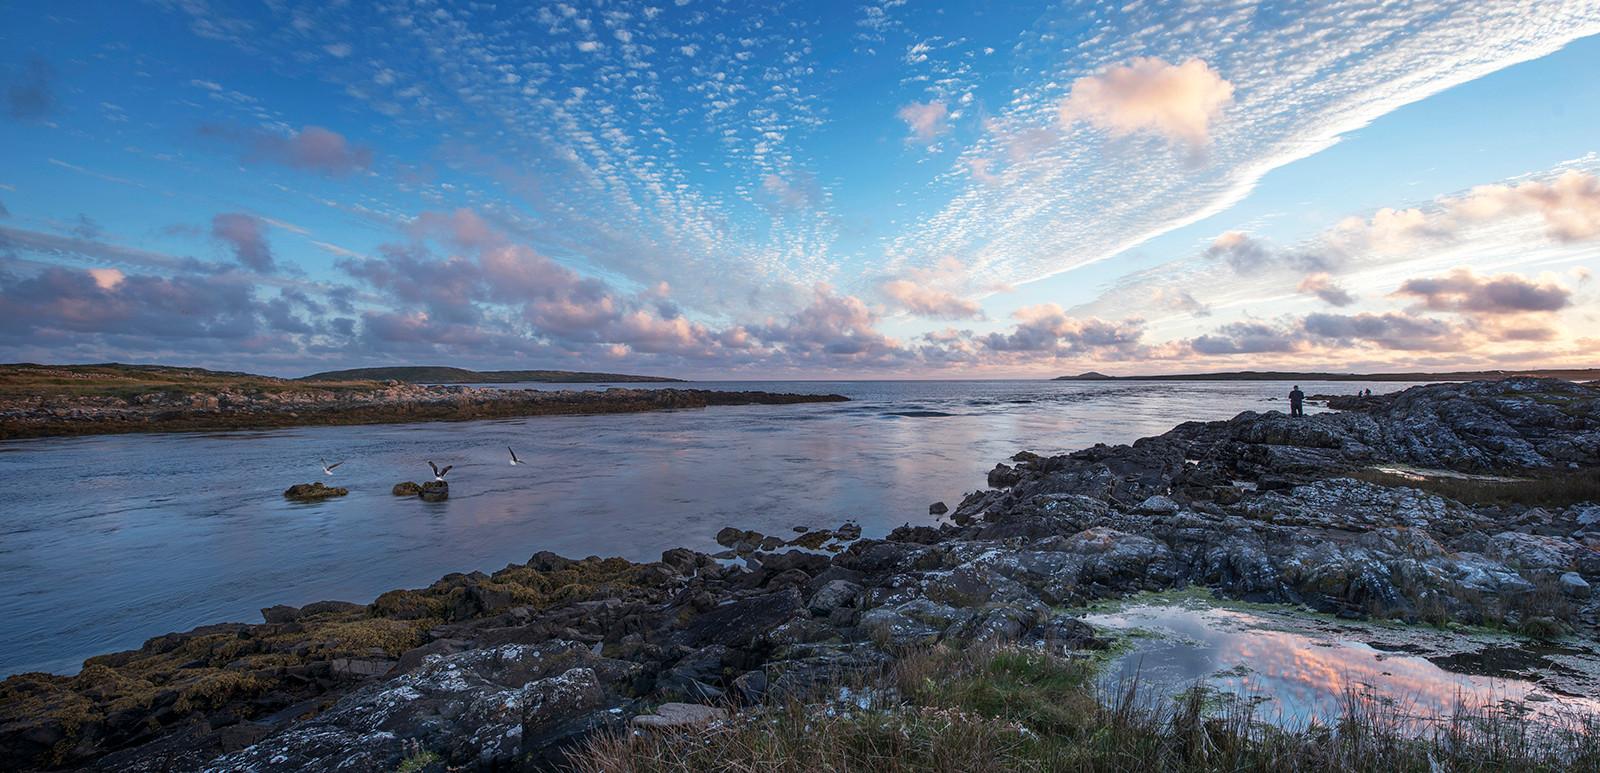 COLOUR - Conammara Reflection by Fionntan O'Meallain (7 marks)